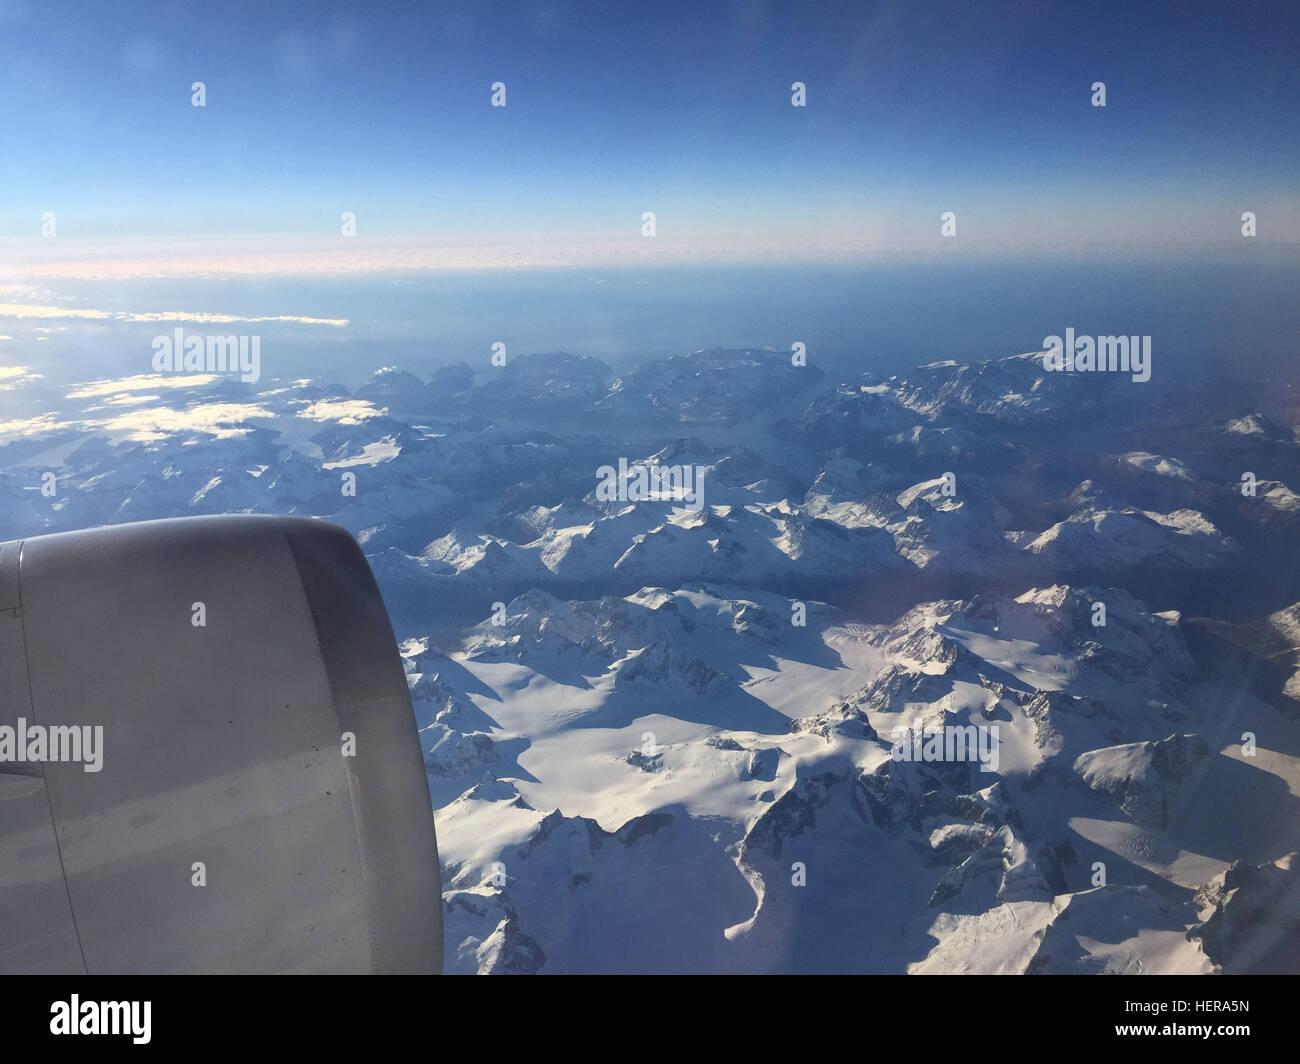 Blick Flugzeugfenster Stock Photos & Blick Flugzeugfenster Stock ...